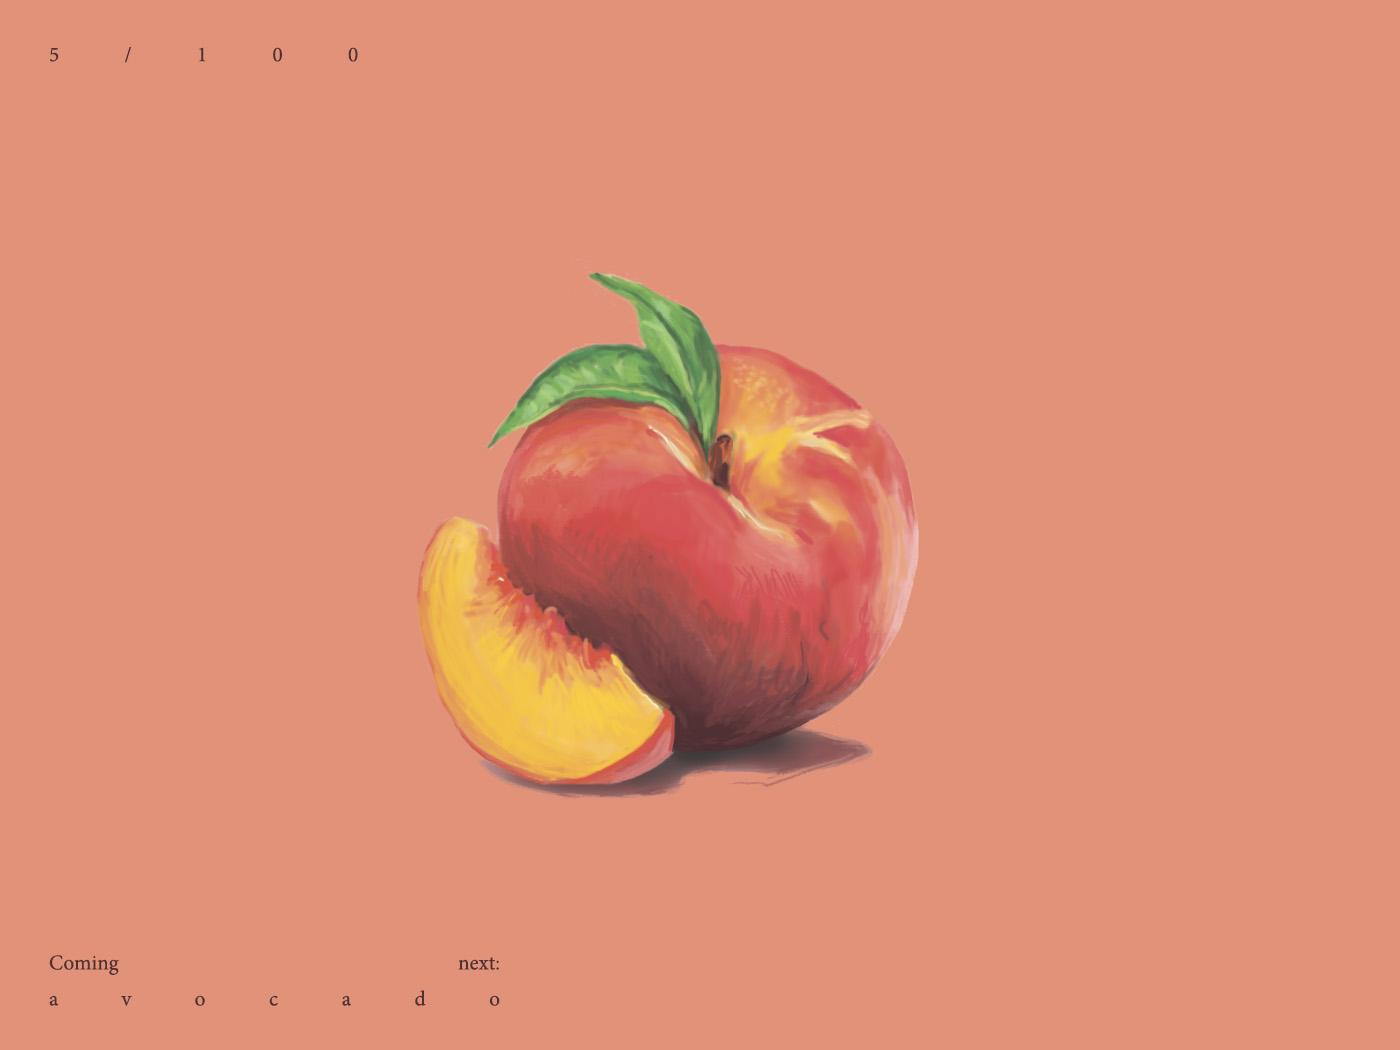 Peach peachy peach fruits fruit photoshop digital drawing contrast design digital illustration vector illustration drawing digital art